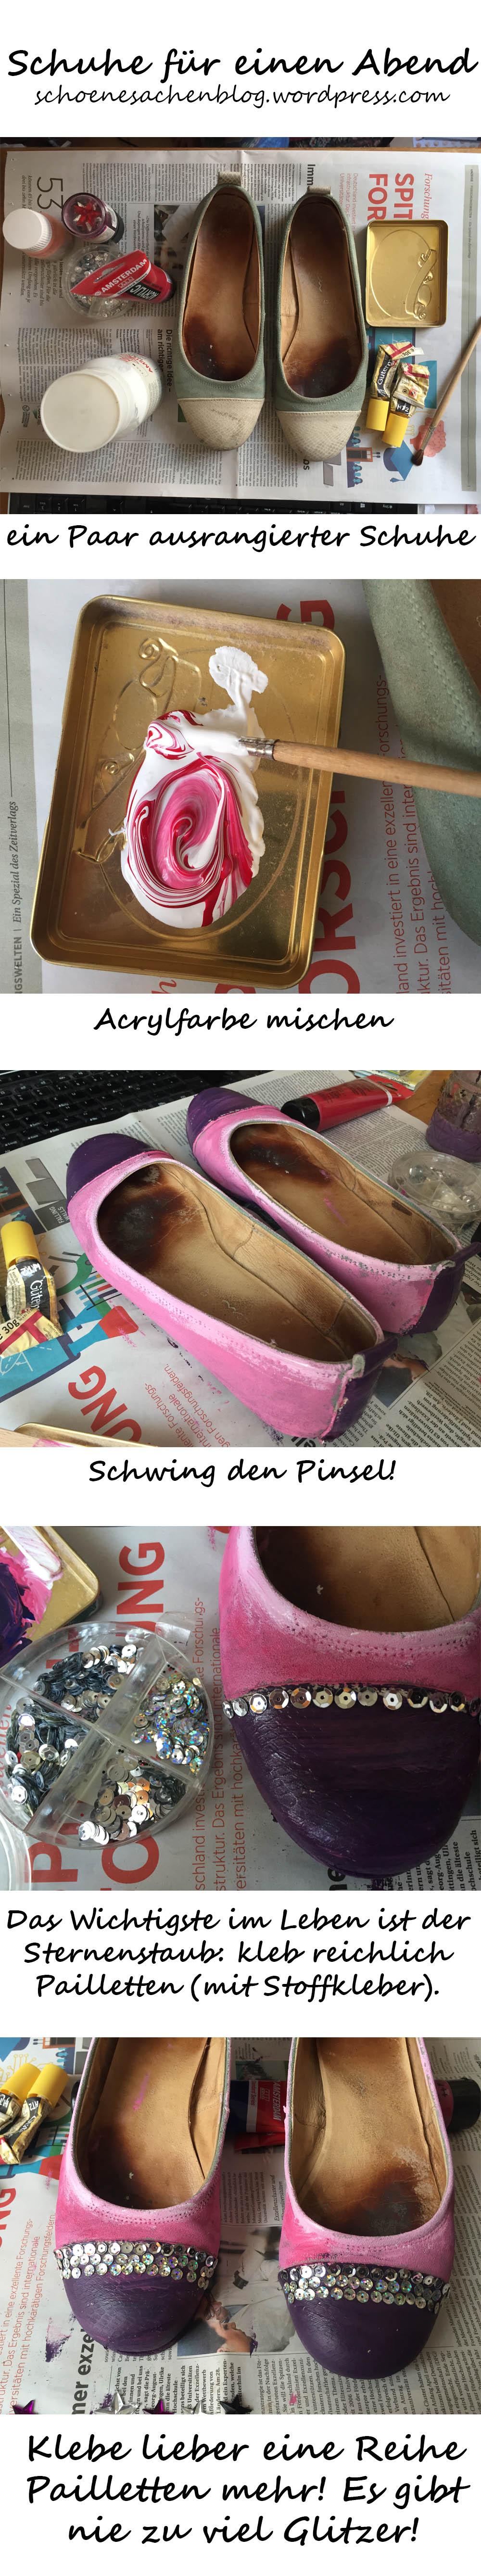 glitzer Schuhe 7